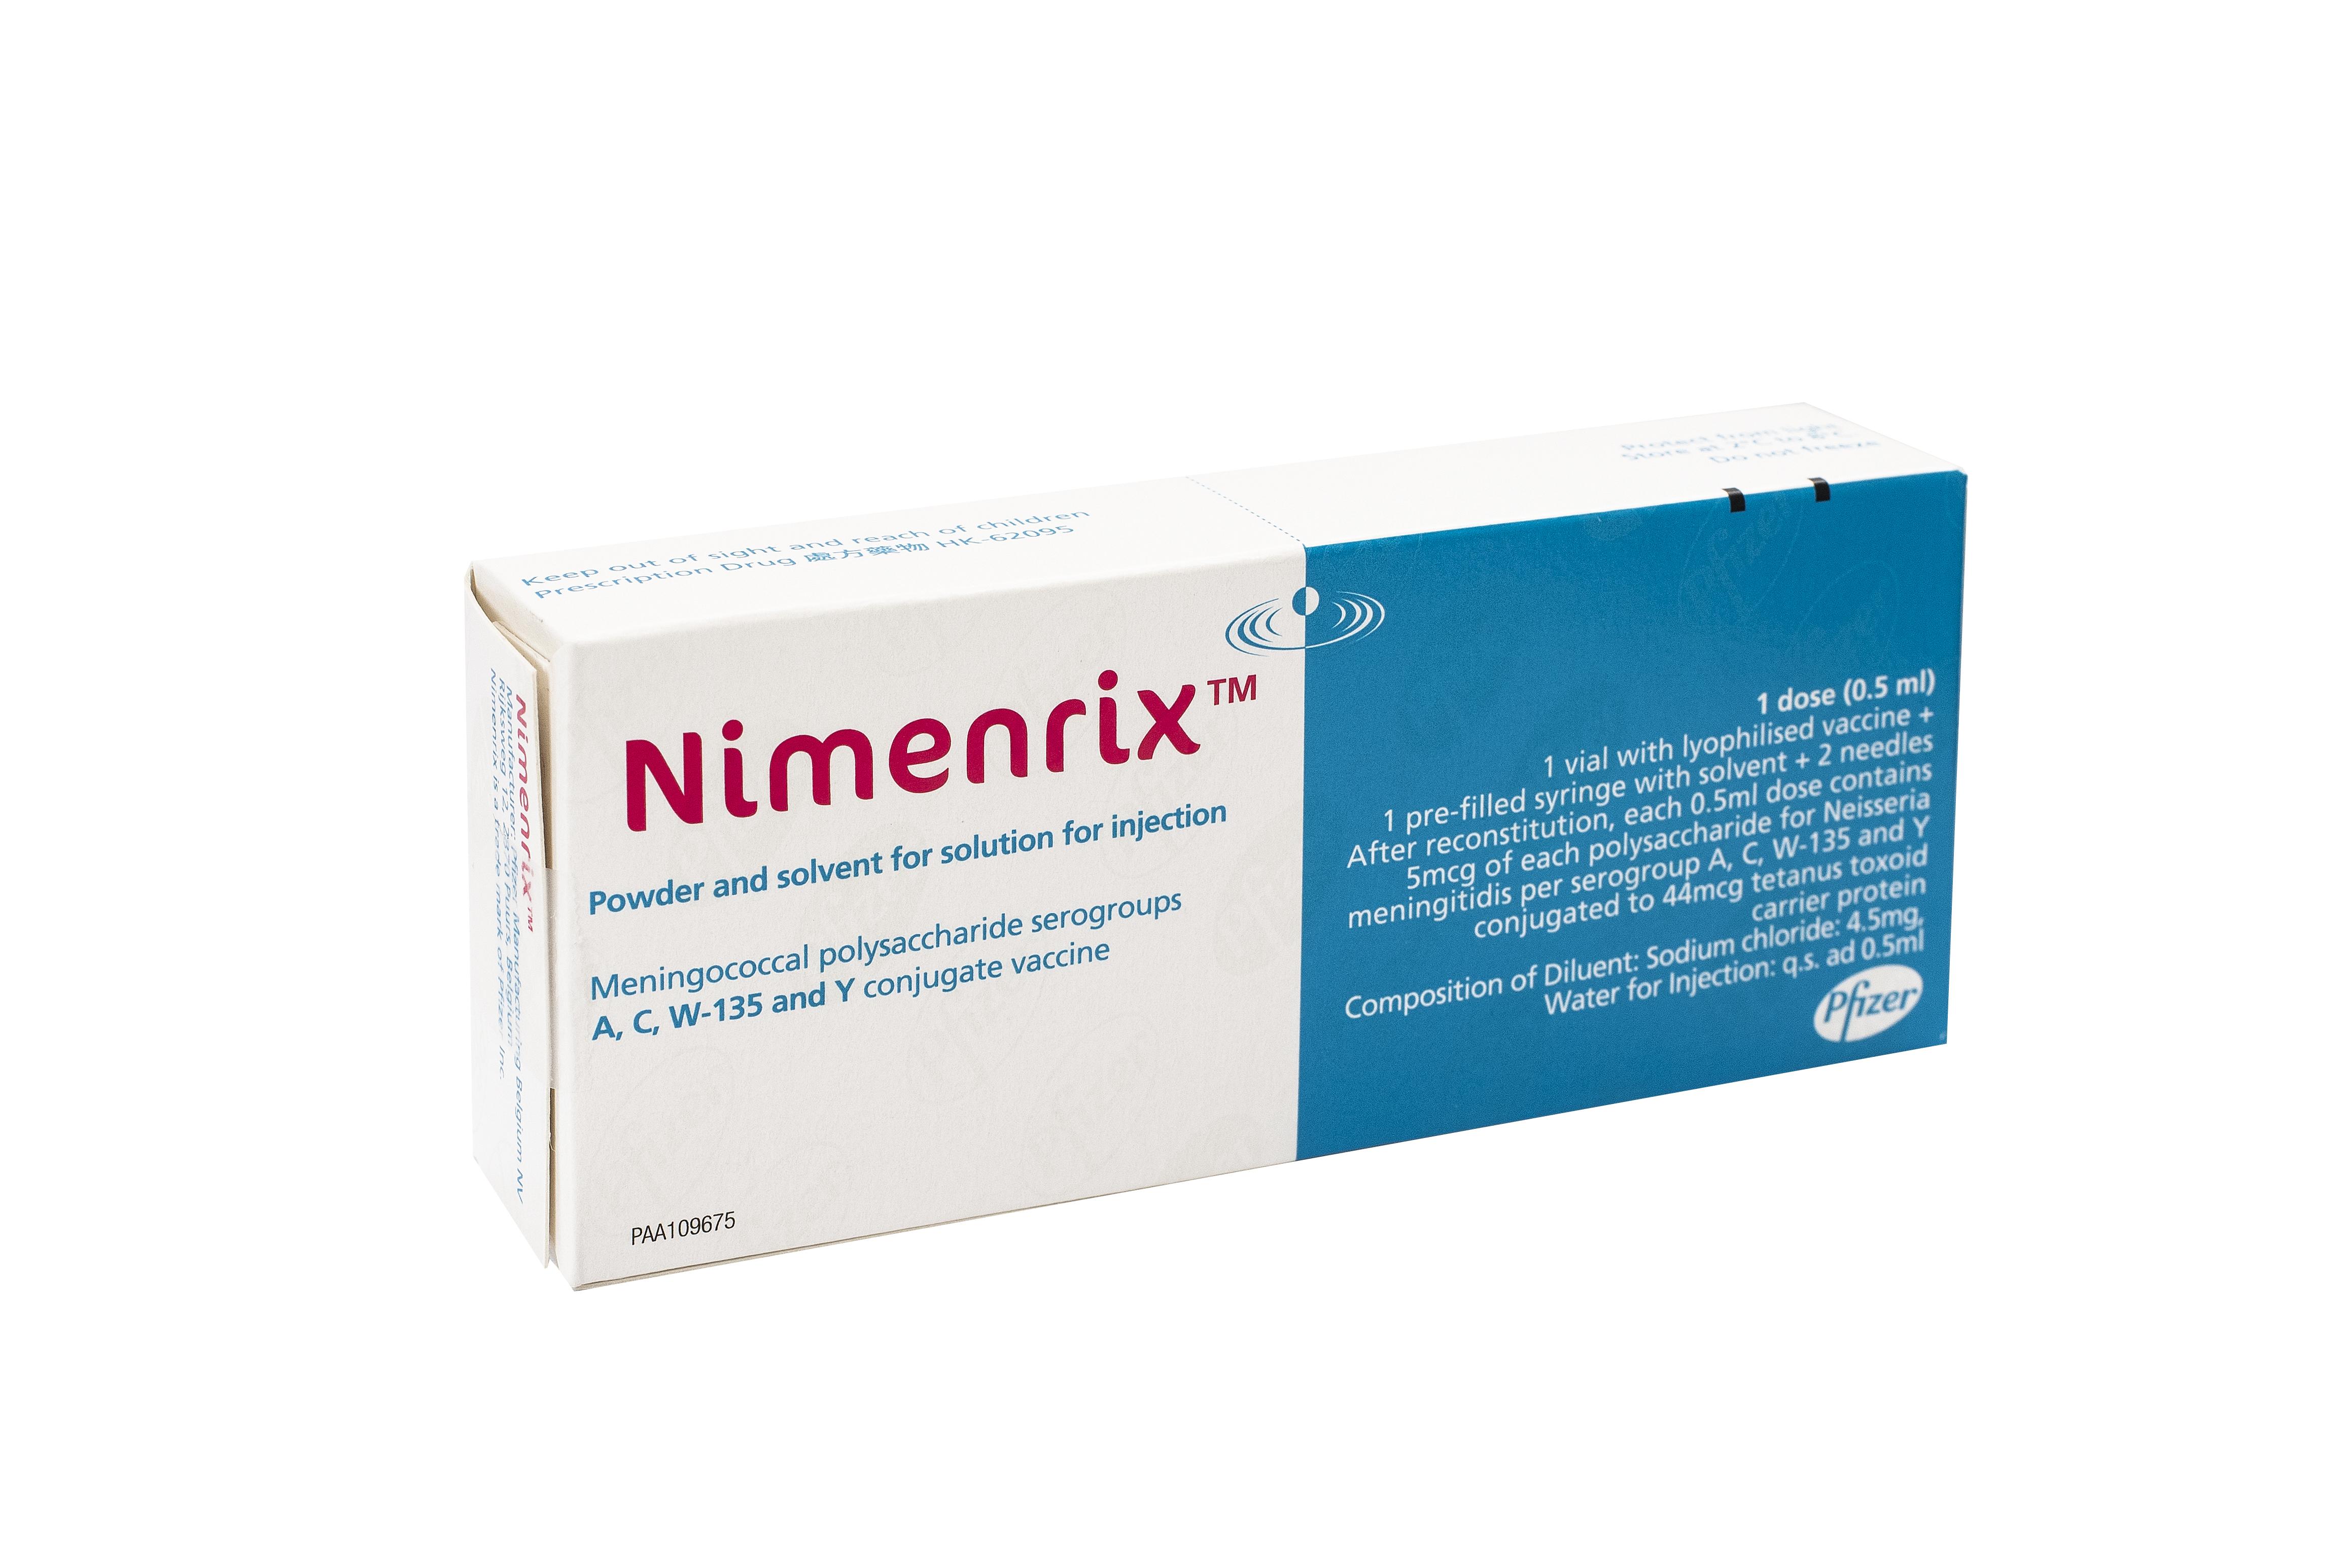 Nimenrix - 腦膜炎雙球菌疫苗 (A,C,W-135,Y血清型) 結合疫苗